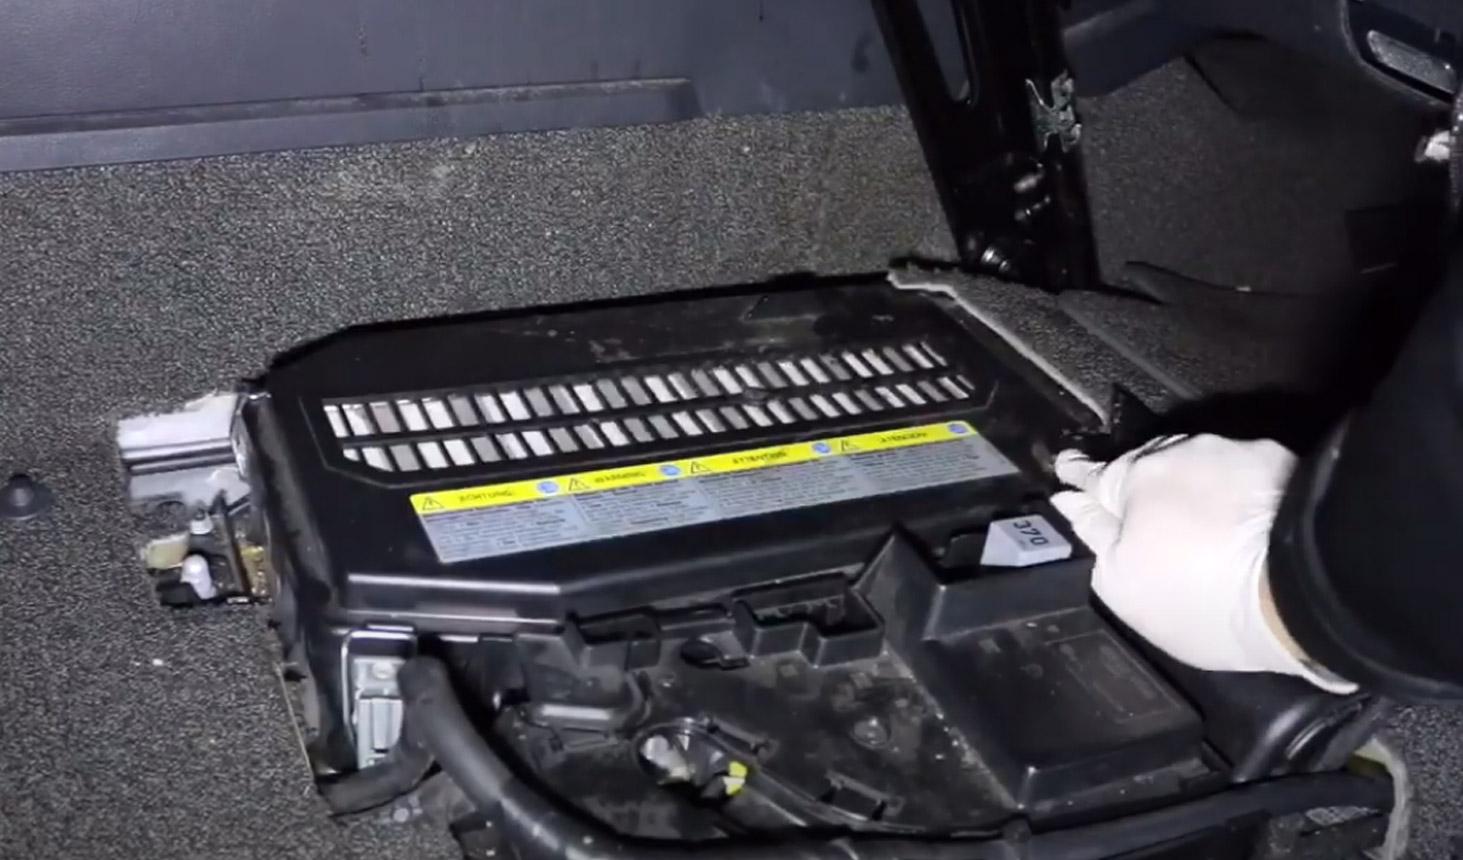 7-tuto-changement-batterie-audi-q7.jpg